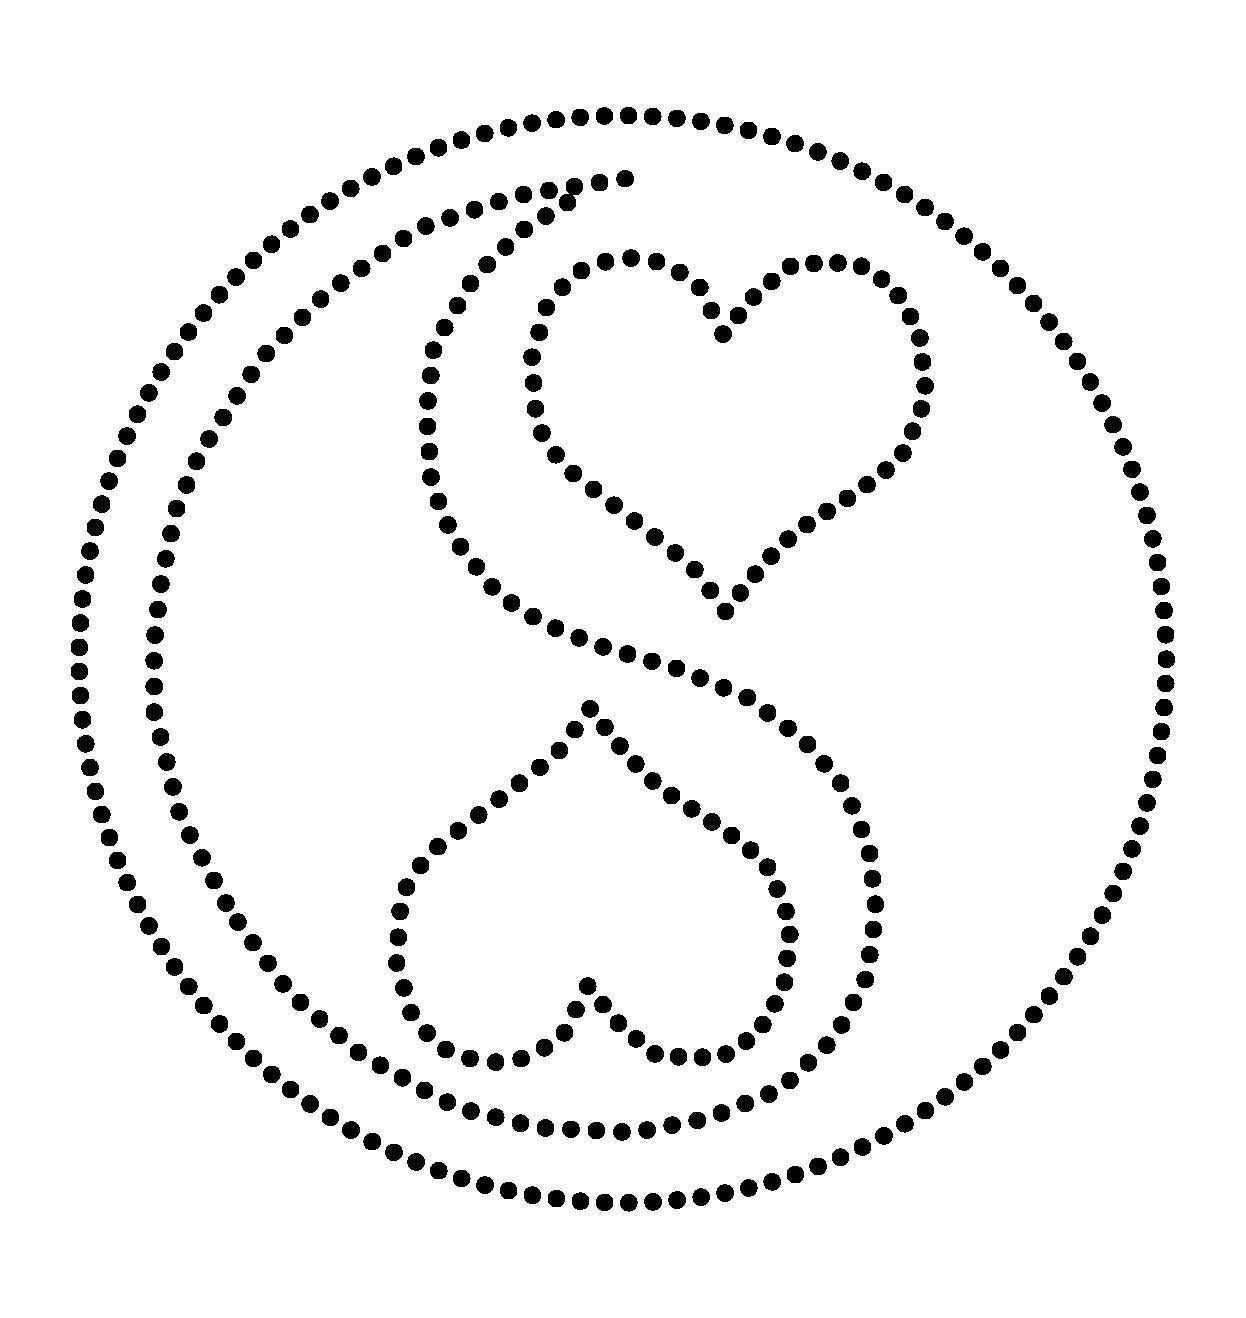 Gulsum Ozbek Adli Kullanicinin Smoothie Recette Panosundaki Pin 2020 Ip Sanati Stensiller Aplike Sablonlari